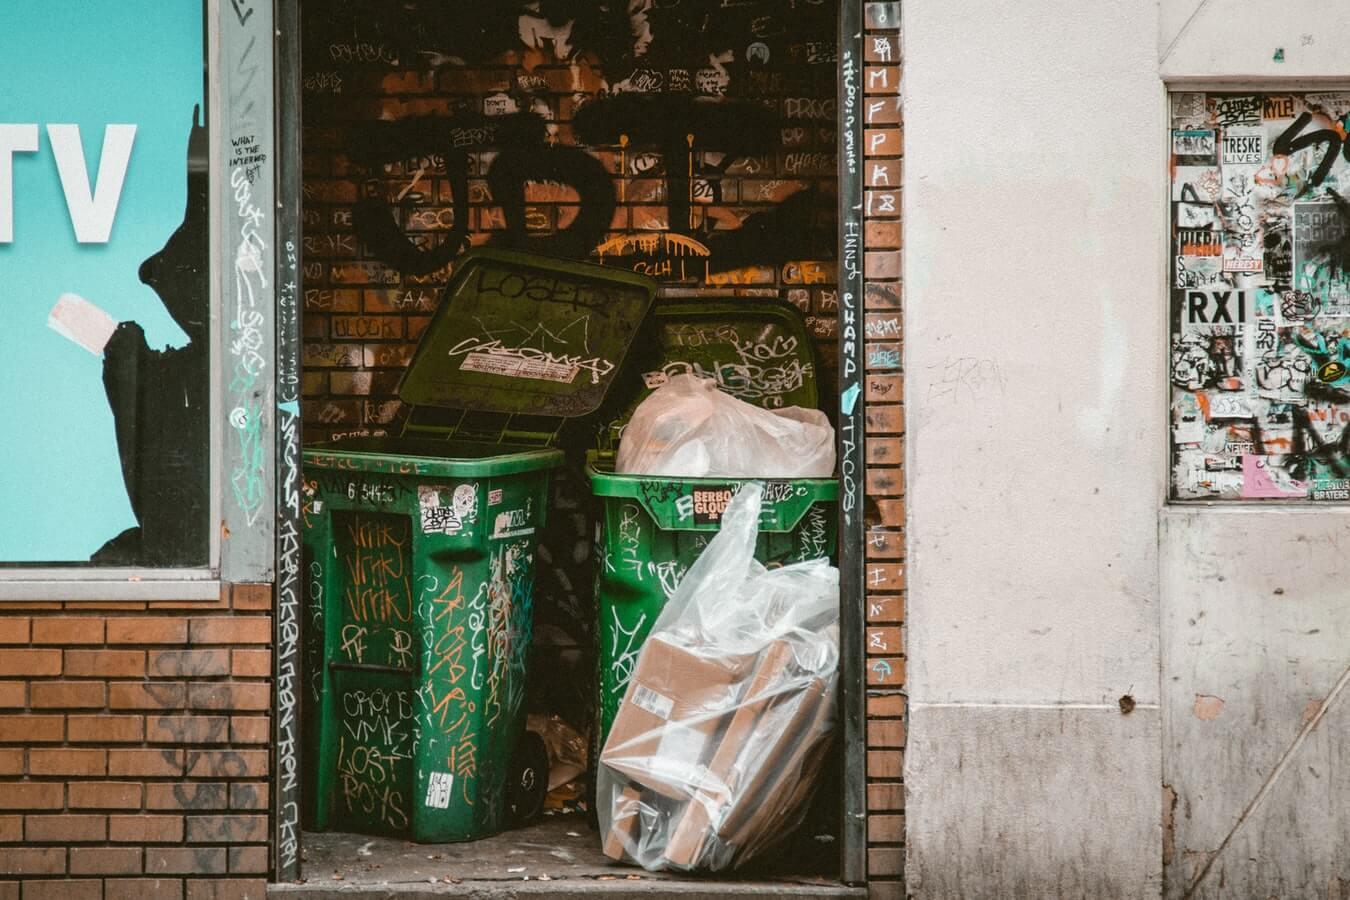 Some bins.